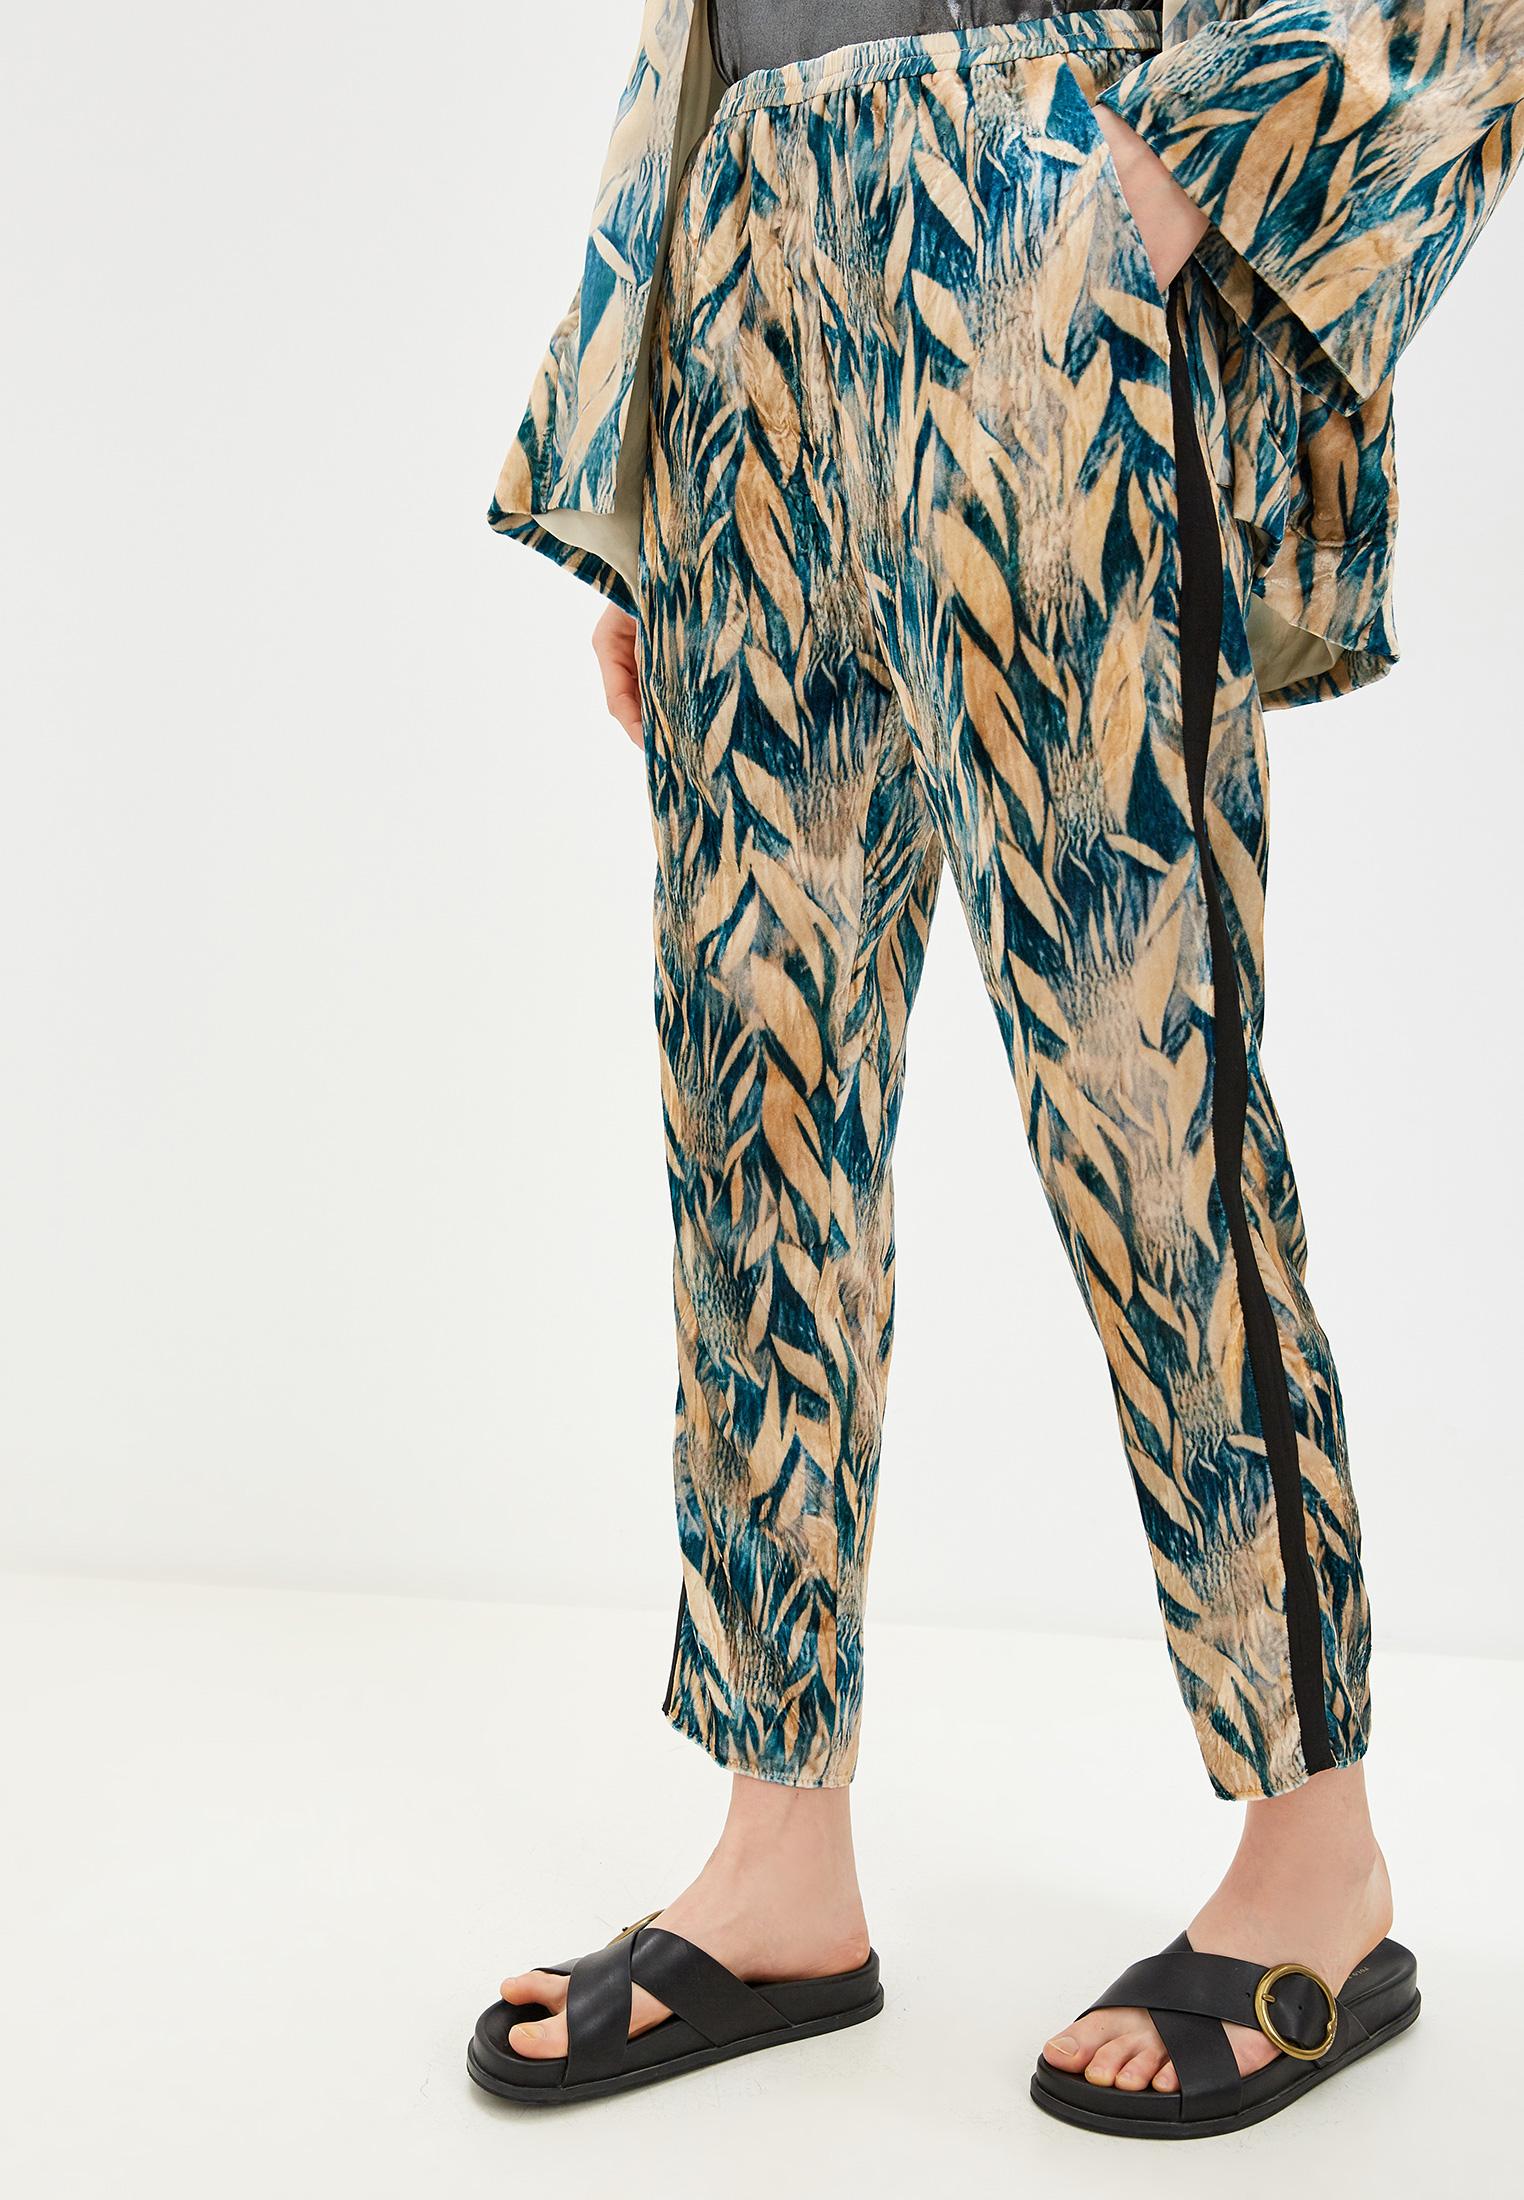 Женские классические брюки Forte Forte 6804